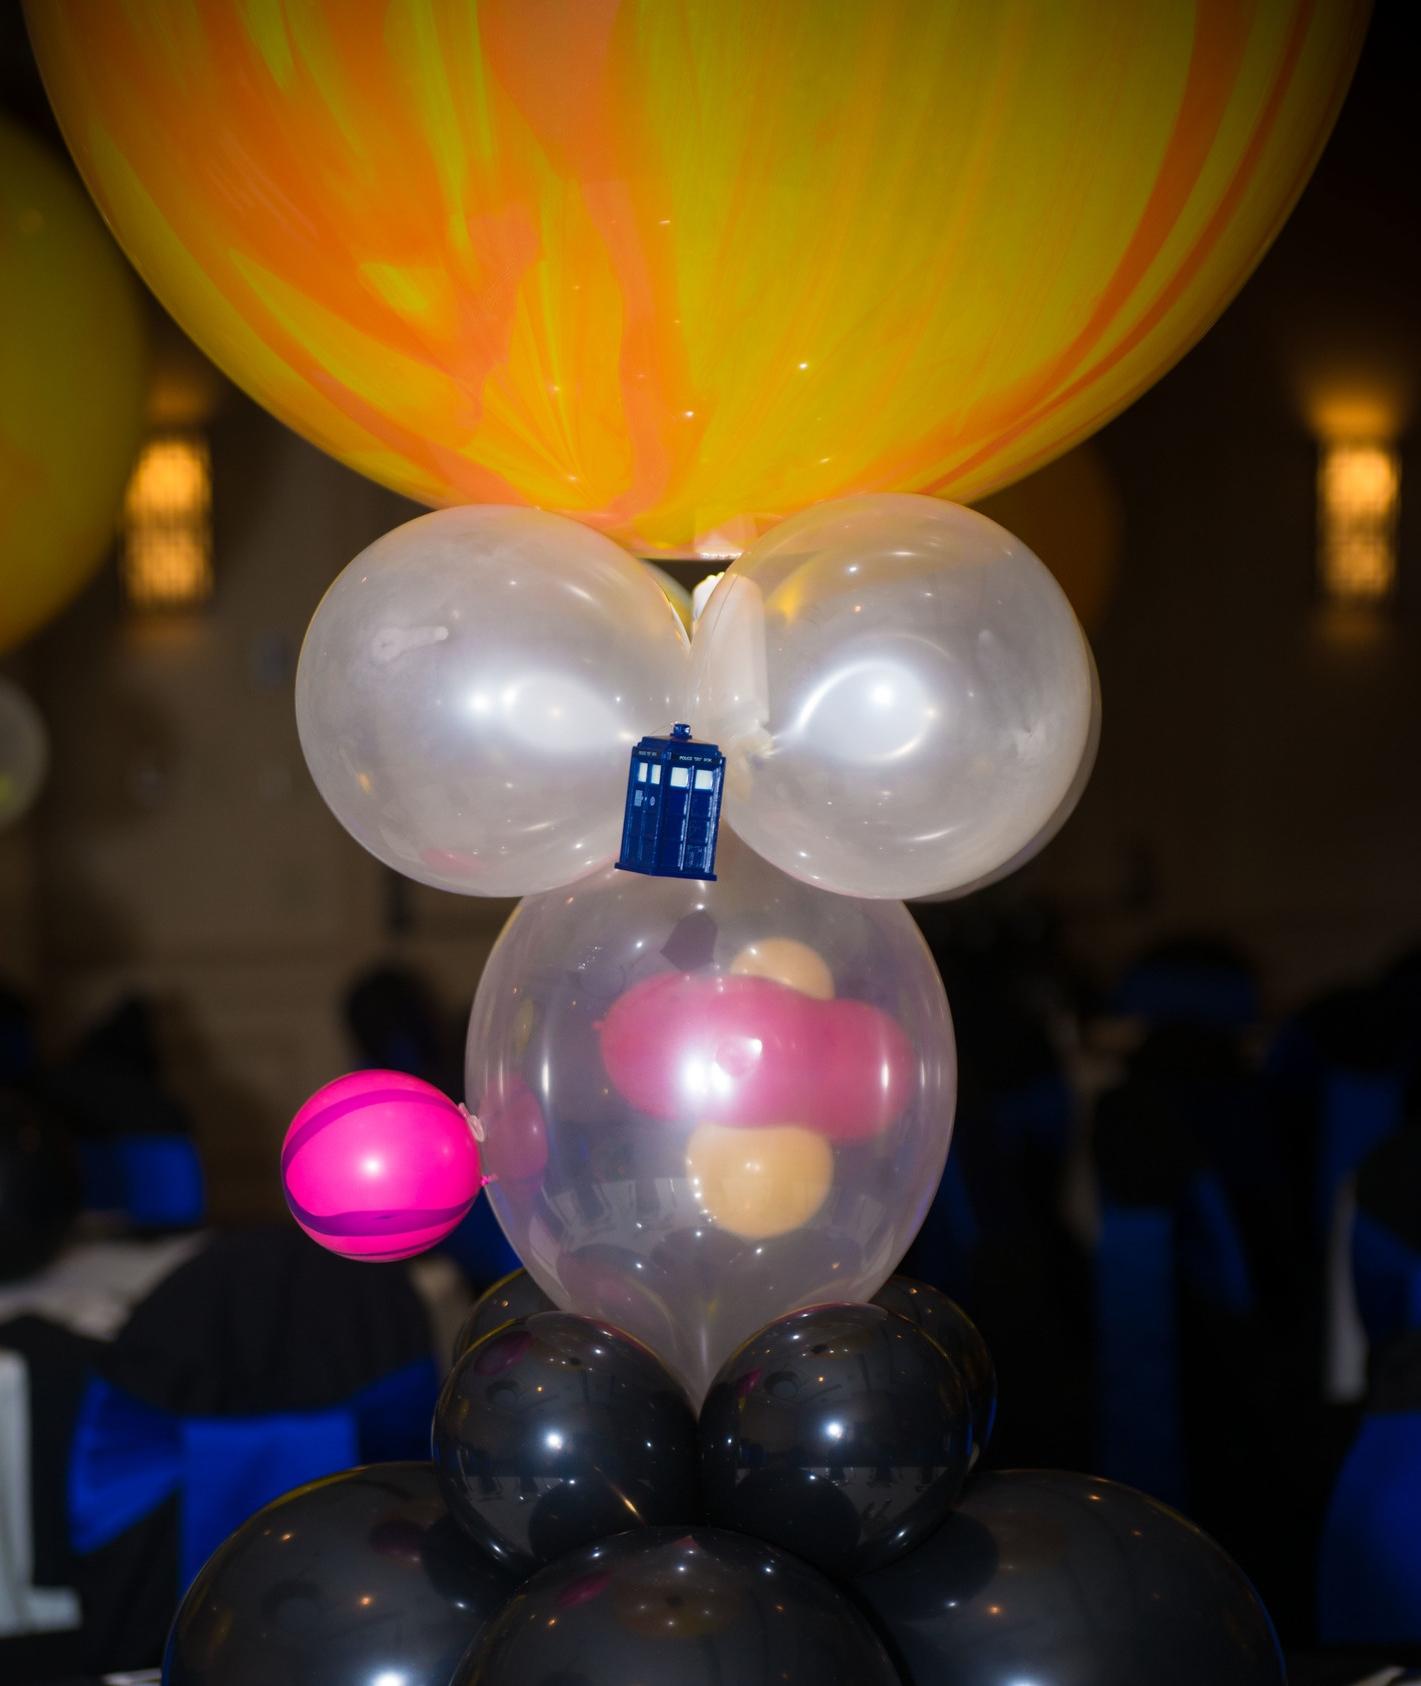 Doctor Who Bar Mitzvah balloon centerpieces - each with illuminated Tardis in orbit